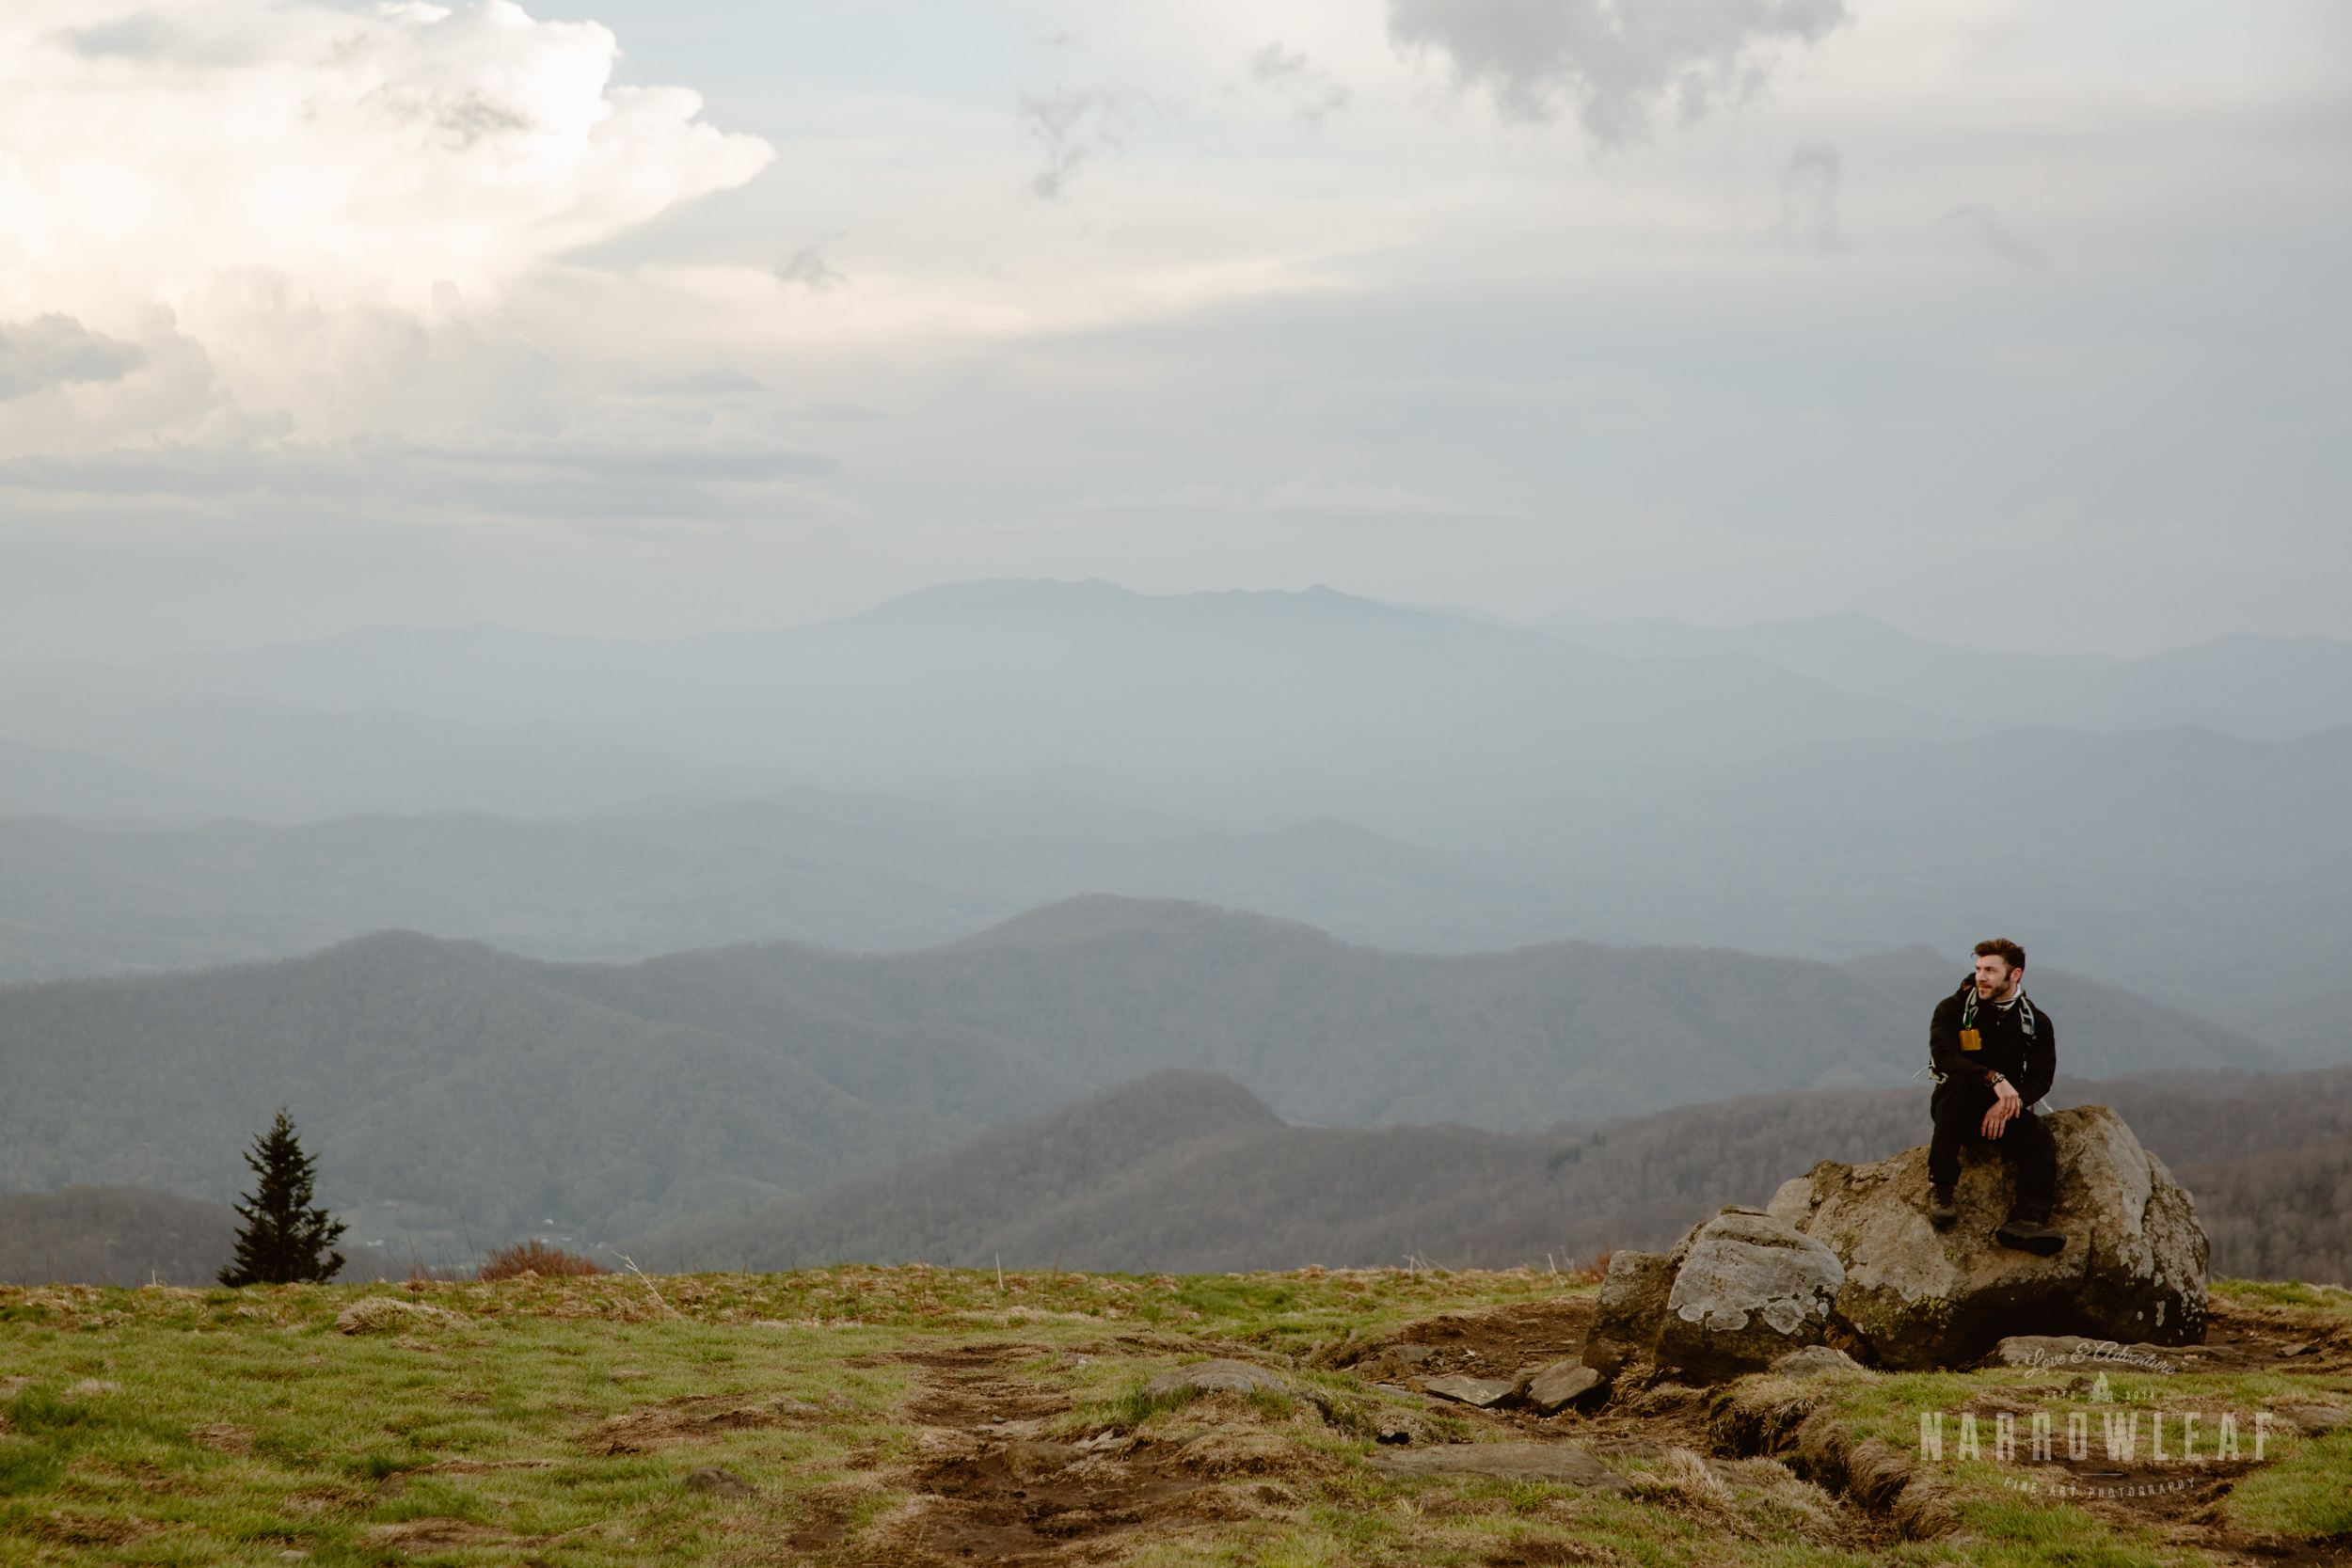 Hiking-Big-Bald-Mountain-Appalachian-Trail-in-Tennessee-Narrowleaf_Love_and_Adventure_Photography-3304.jpg